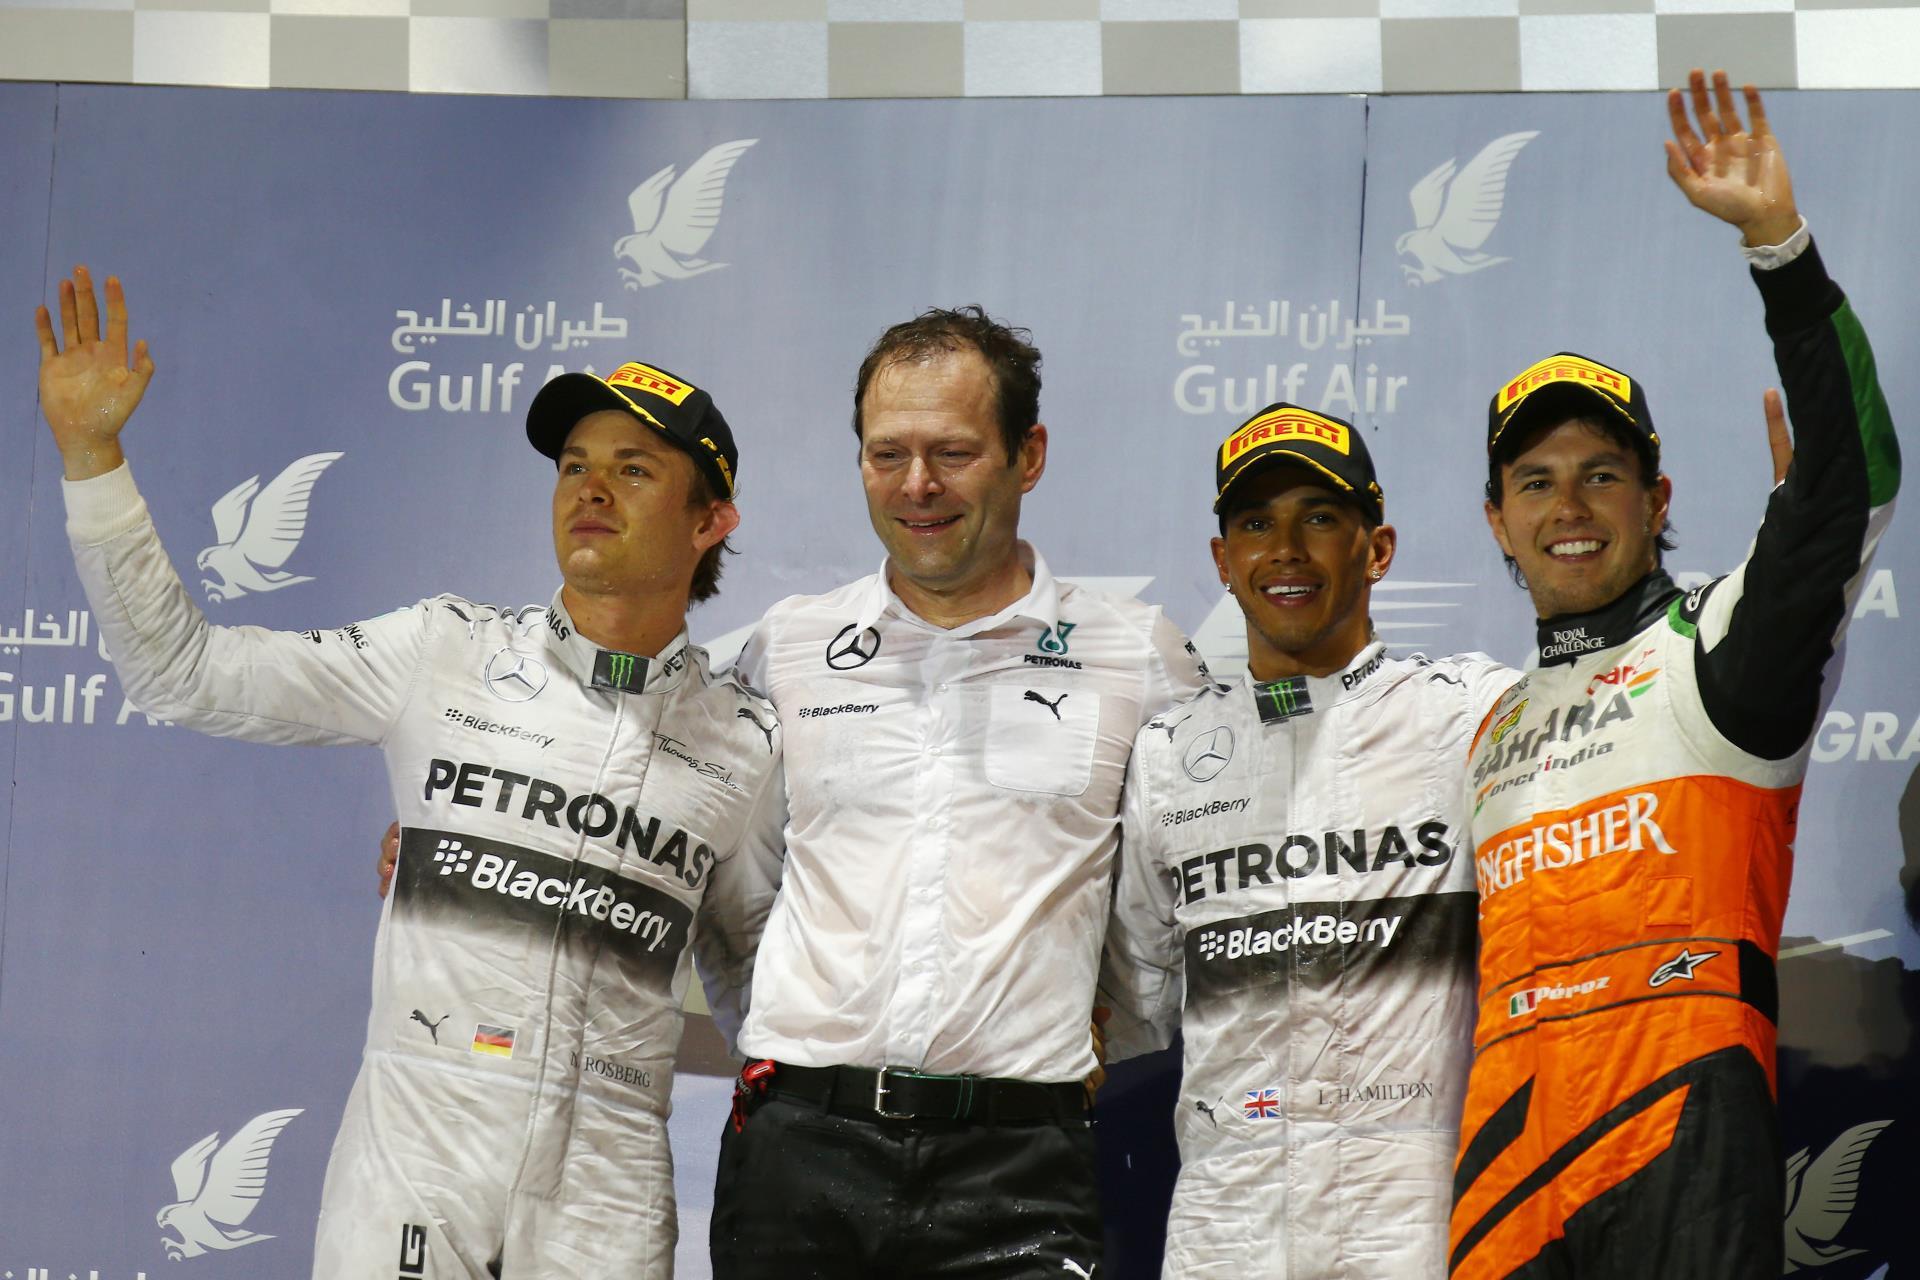 Bahrain F1 2014 podium Hamilton Rosberg Perez Foto Force India